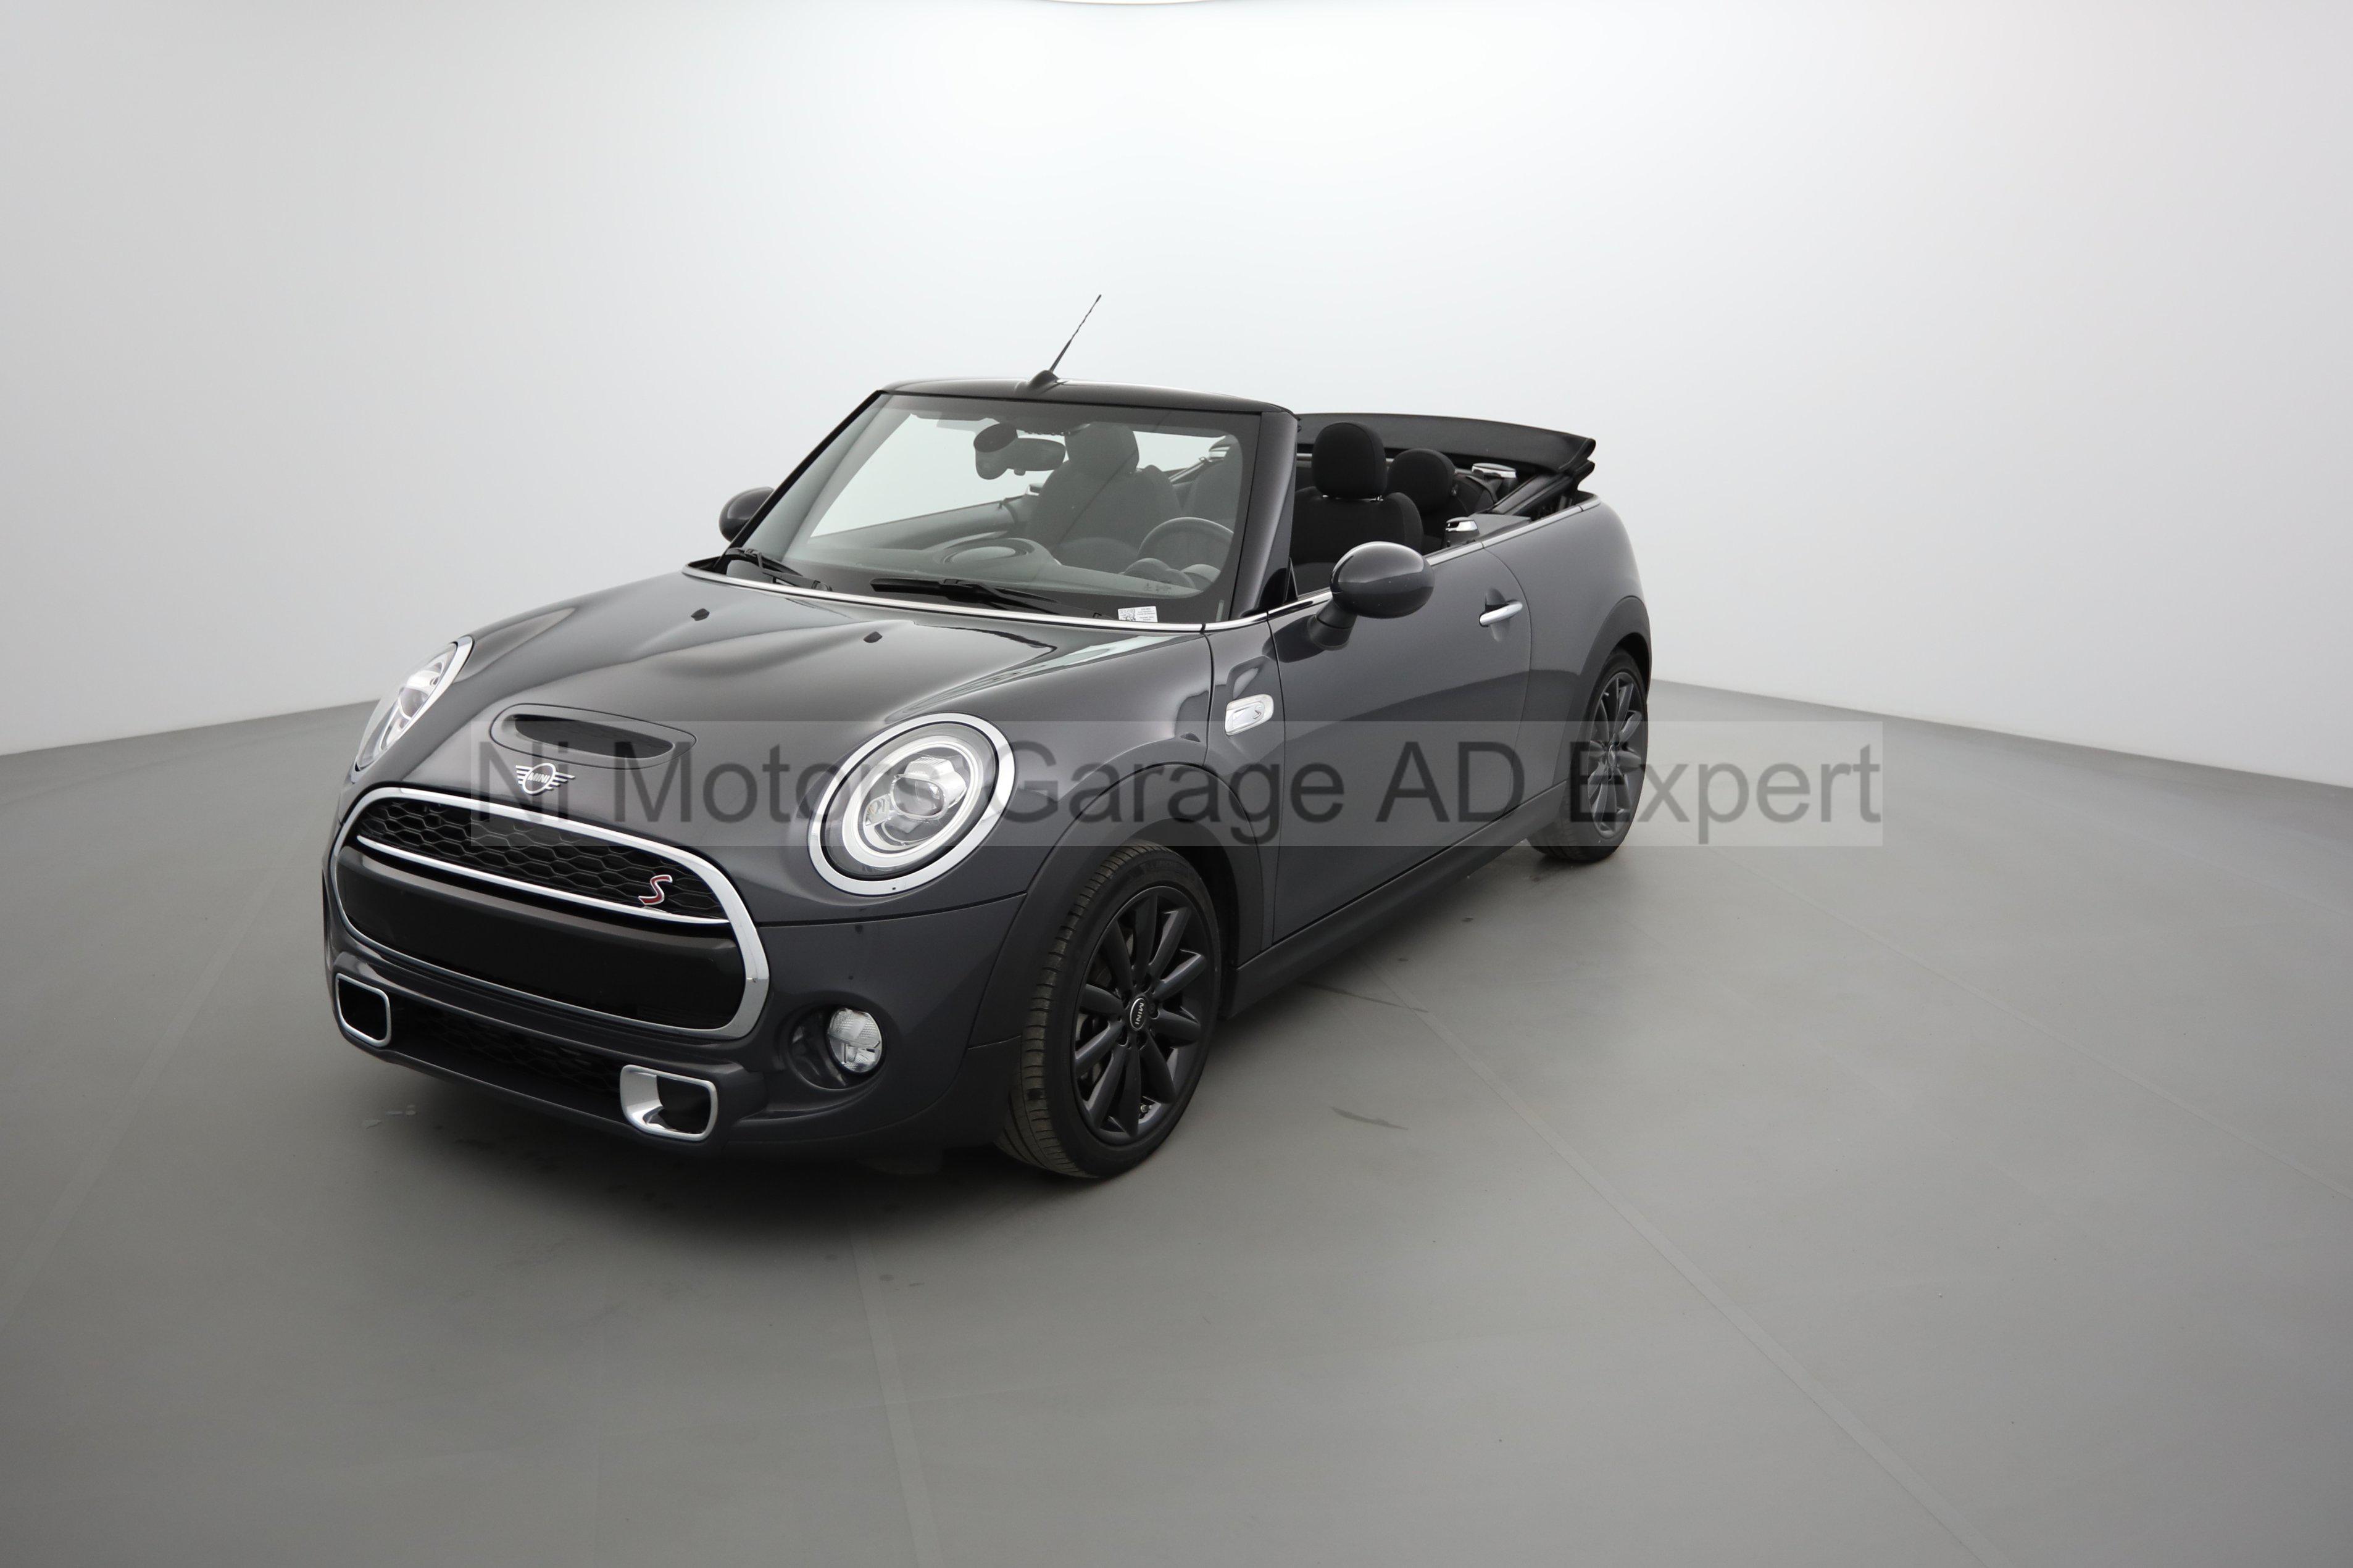 Mini Mini Cabriolet F57 Lci Bourgoin Jallieu 172855 Ni Motors